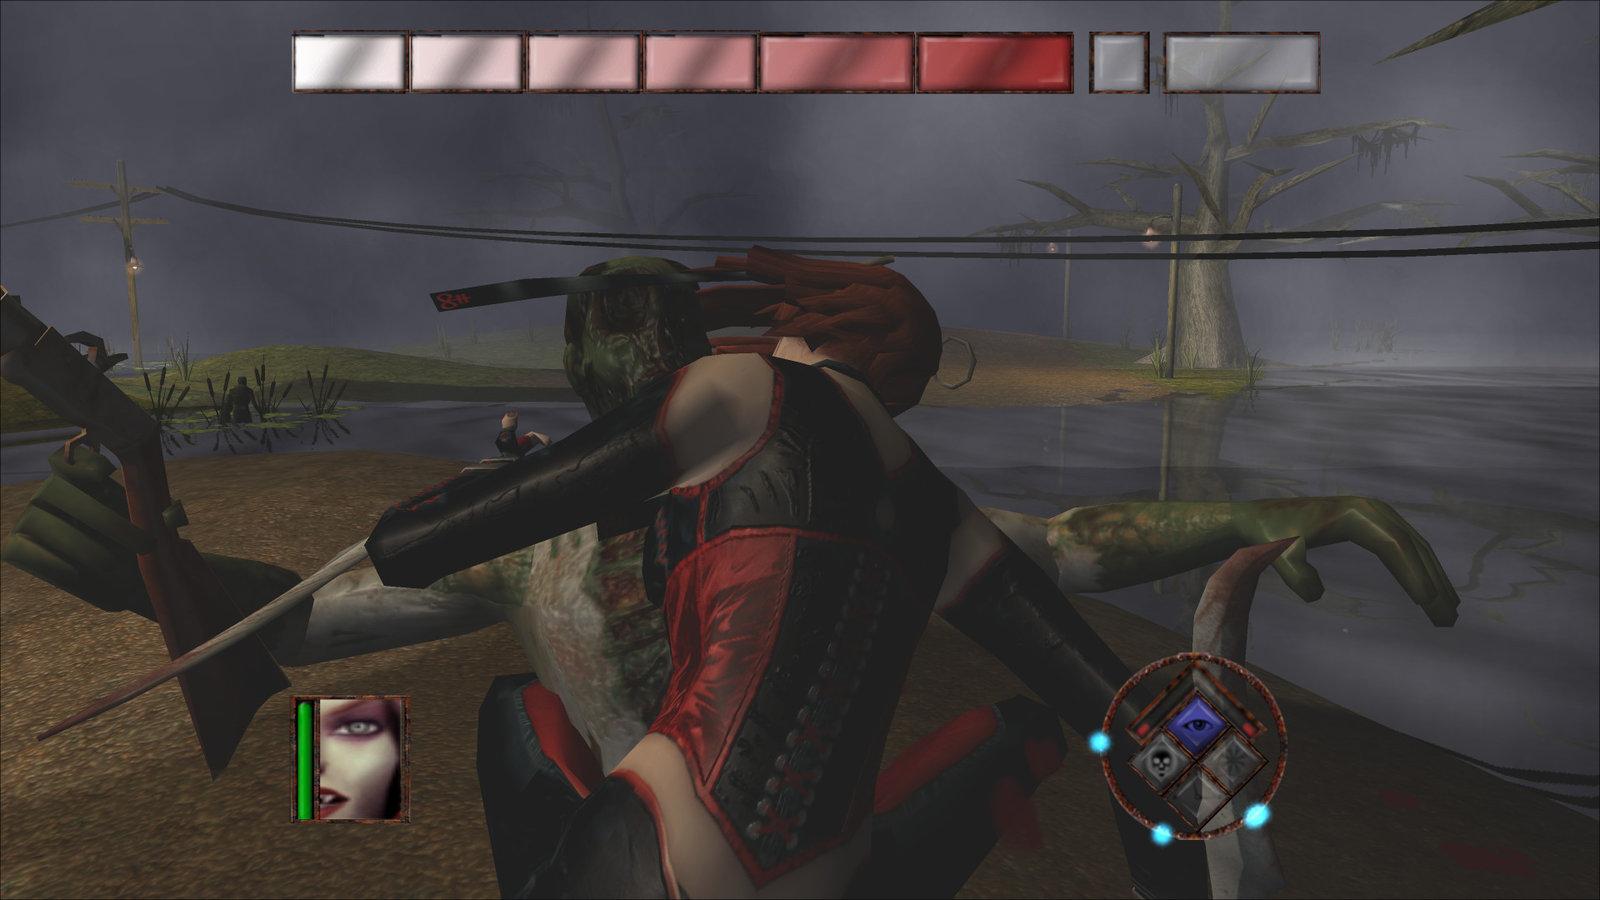 BloodRayne: Terminal Cut image 1